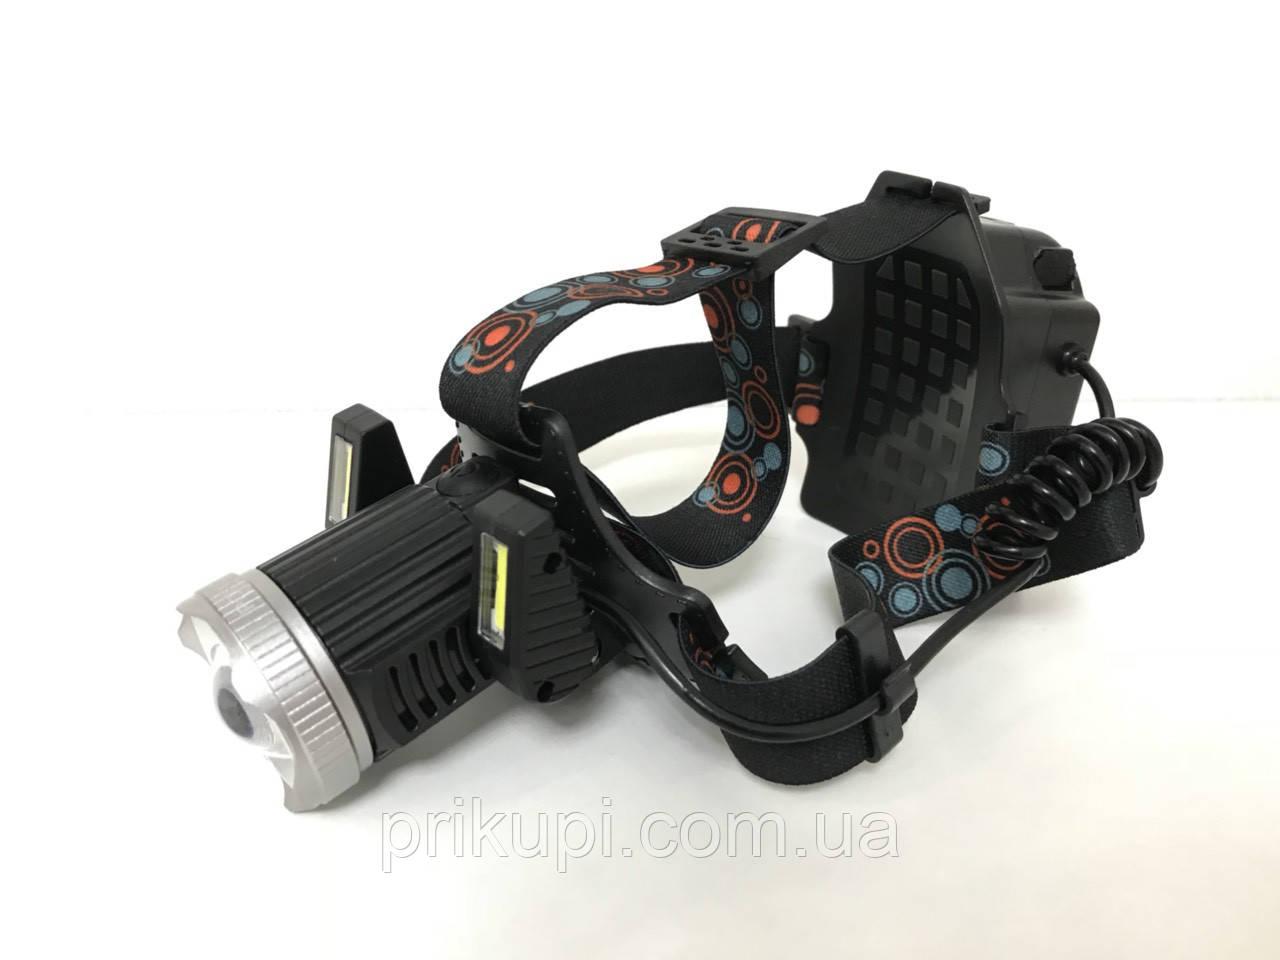 Налобний ліхтар з акумулятором або на батарейках 3*АА Police JR-6000-T6 2COB